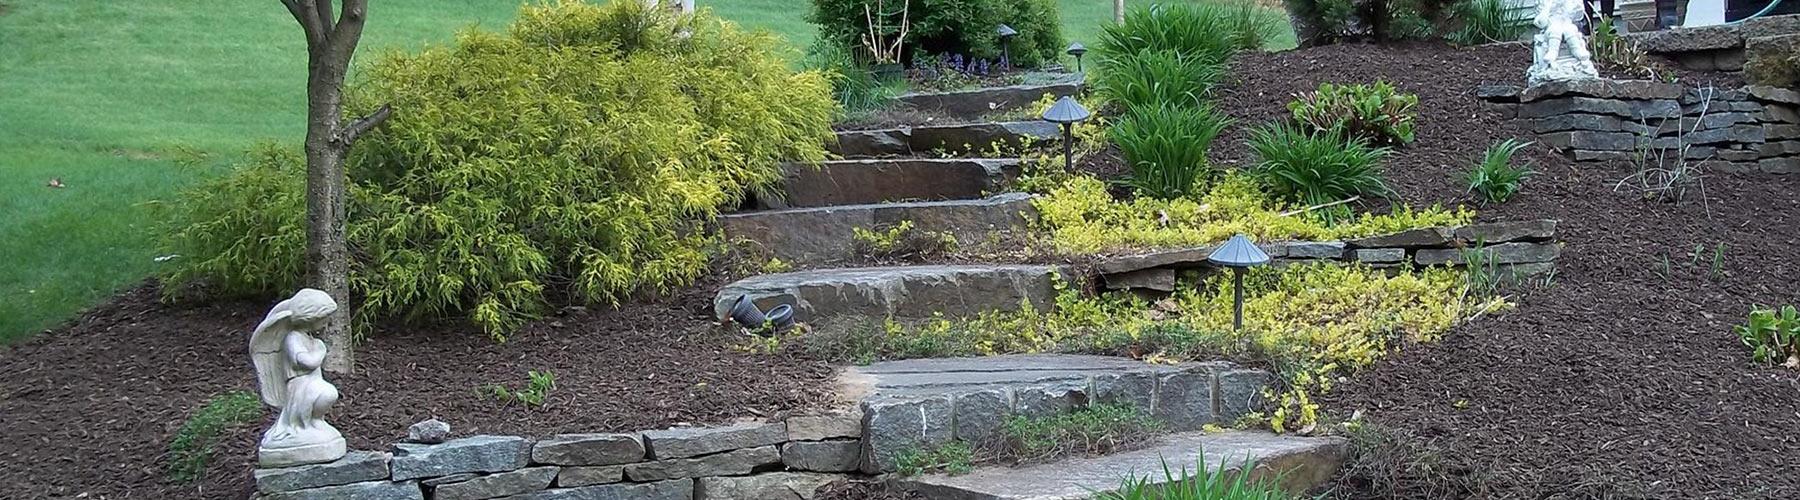 Stone Ledge Steps with Angel